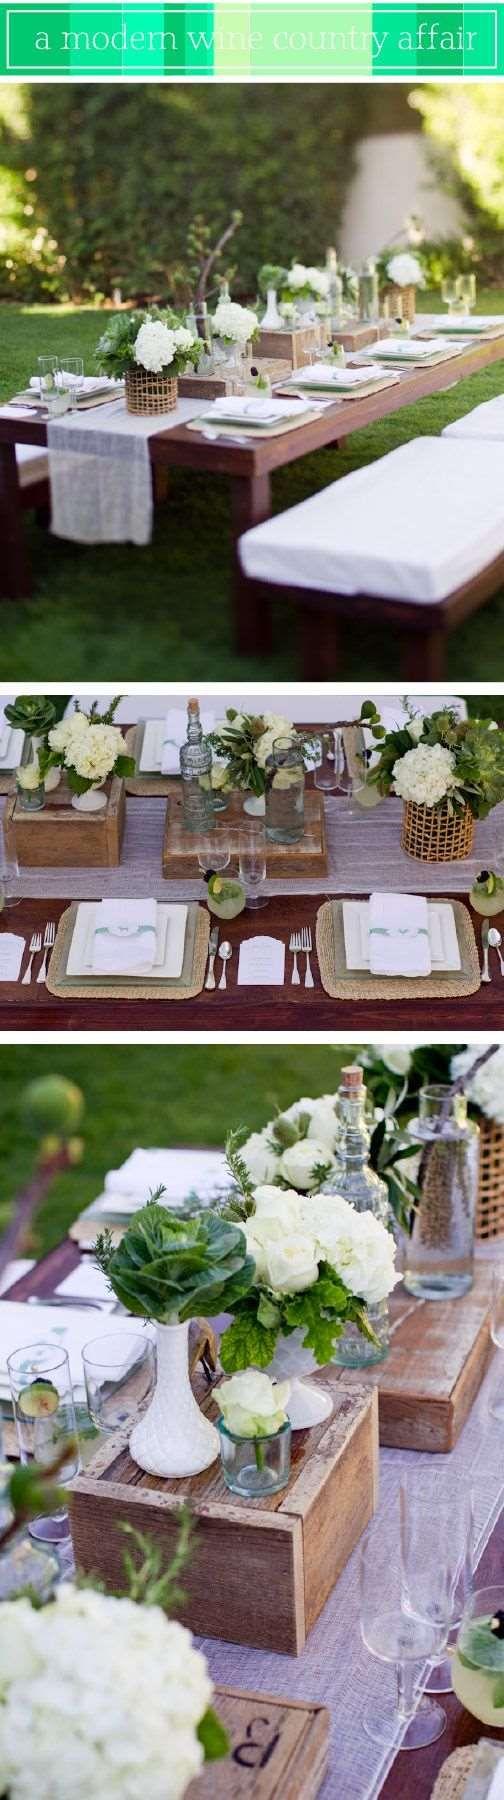 1000+ images about Decoração de casamento on Pinterest  Receptions